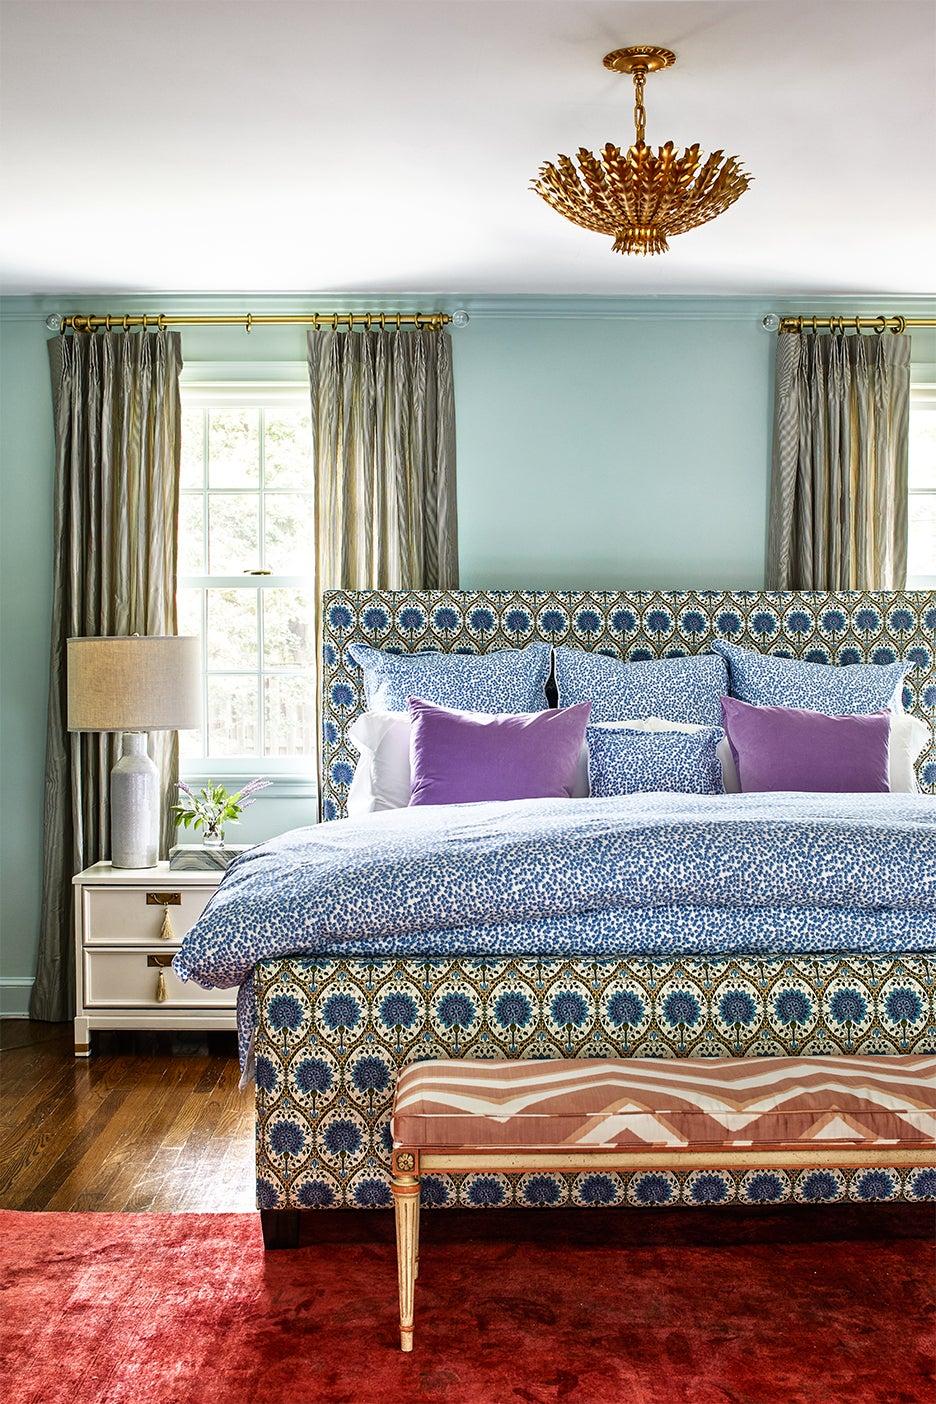 cozy bedroom with upholstered headboard